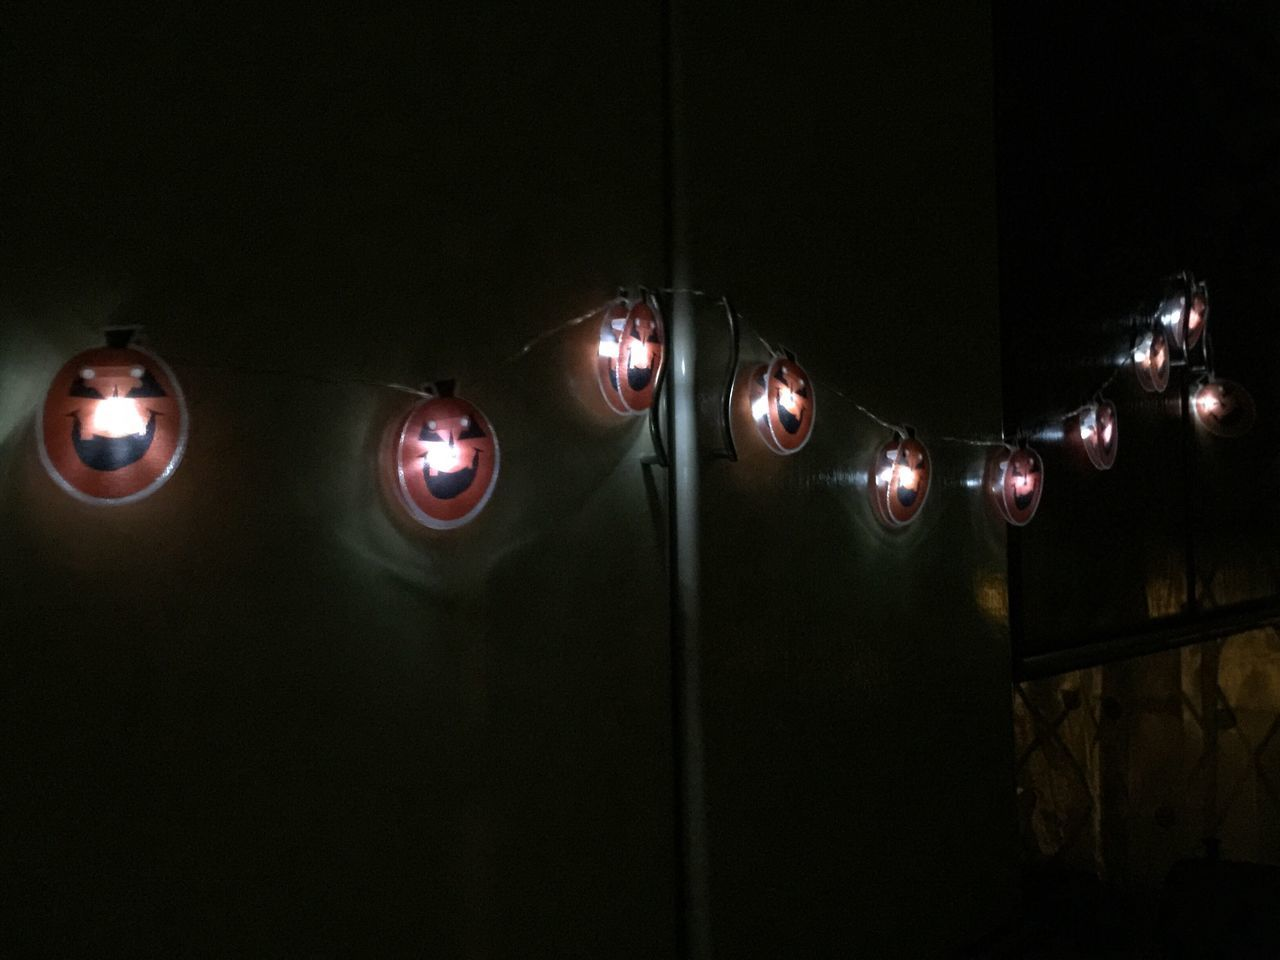 illuminated, night, no people, indoors, electricity, technology, sky